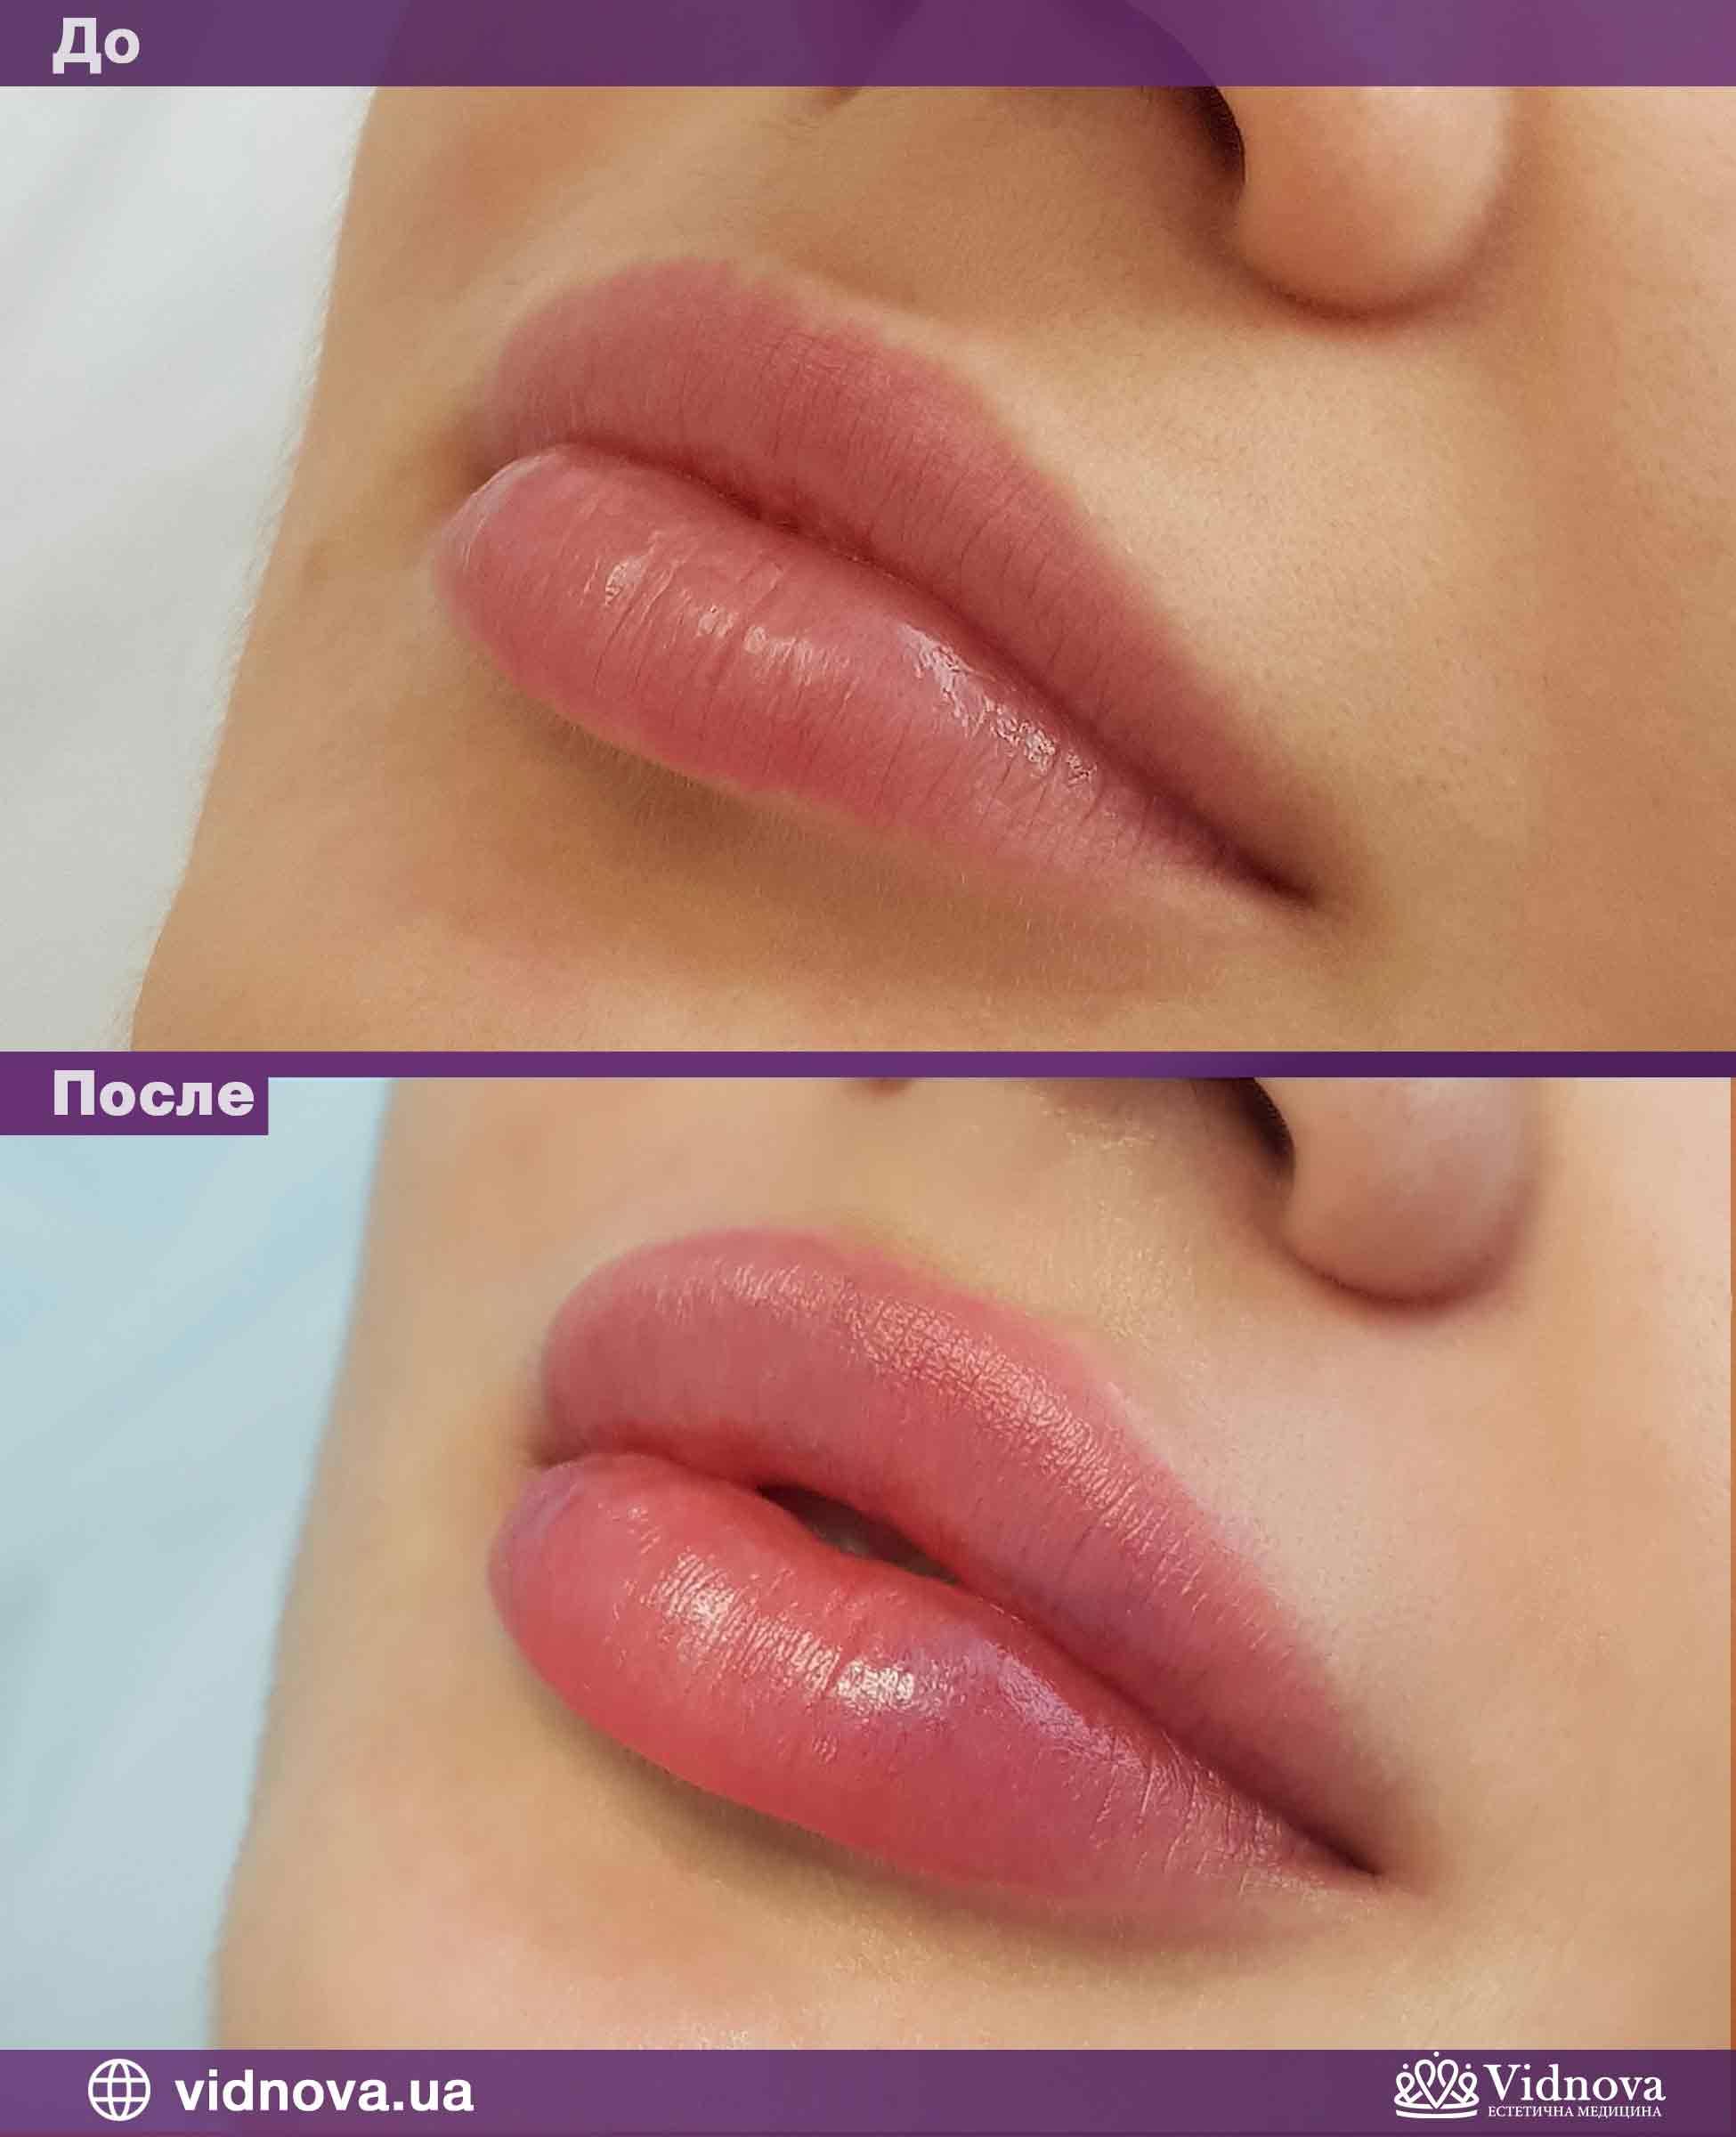 Увеличение губ: Фото До и После - Пример №4-1 - Клиника Vidnova